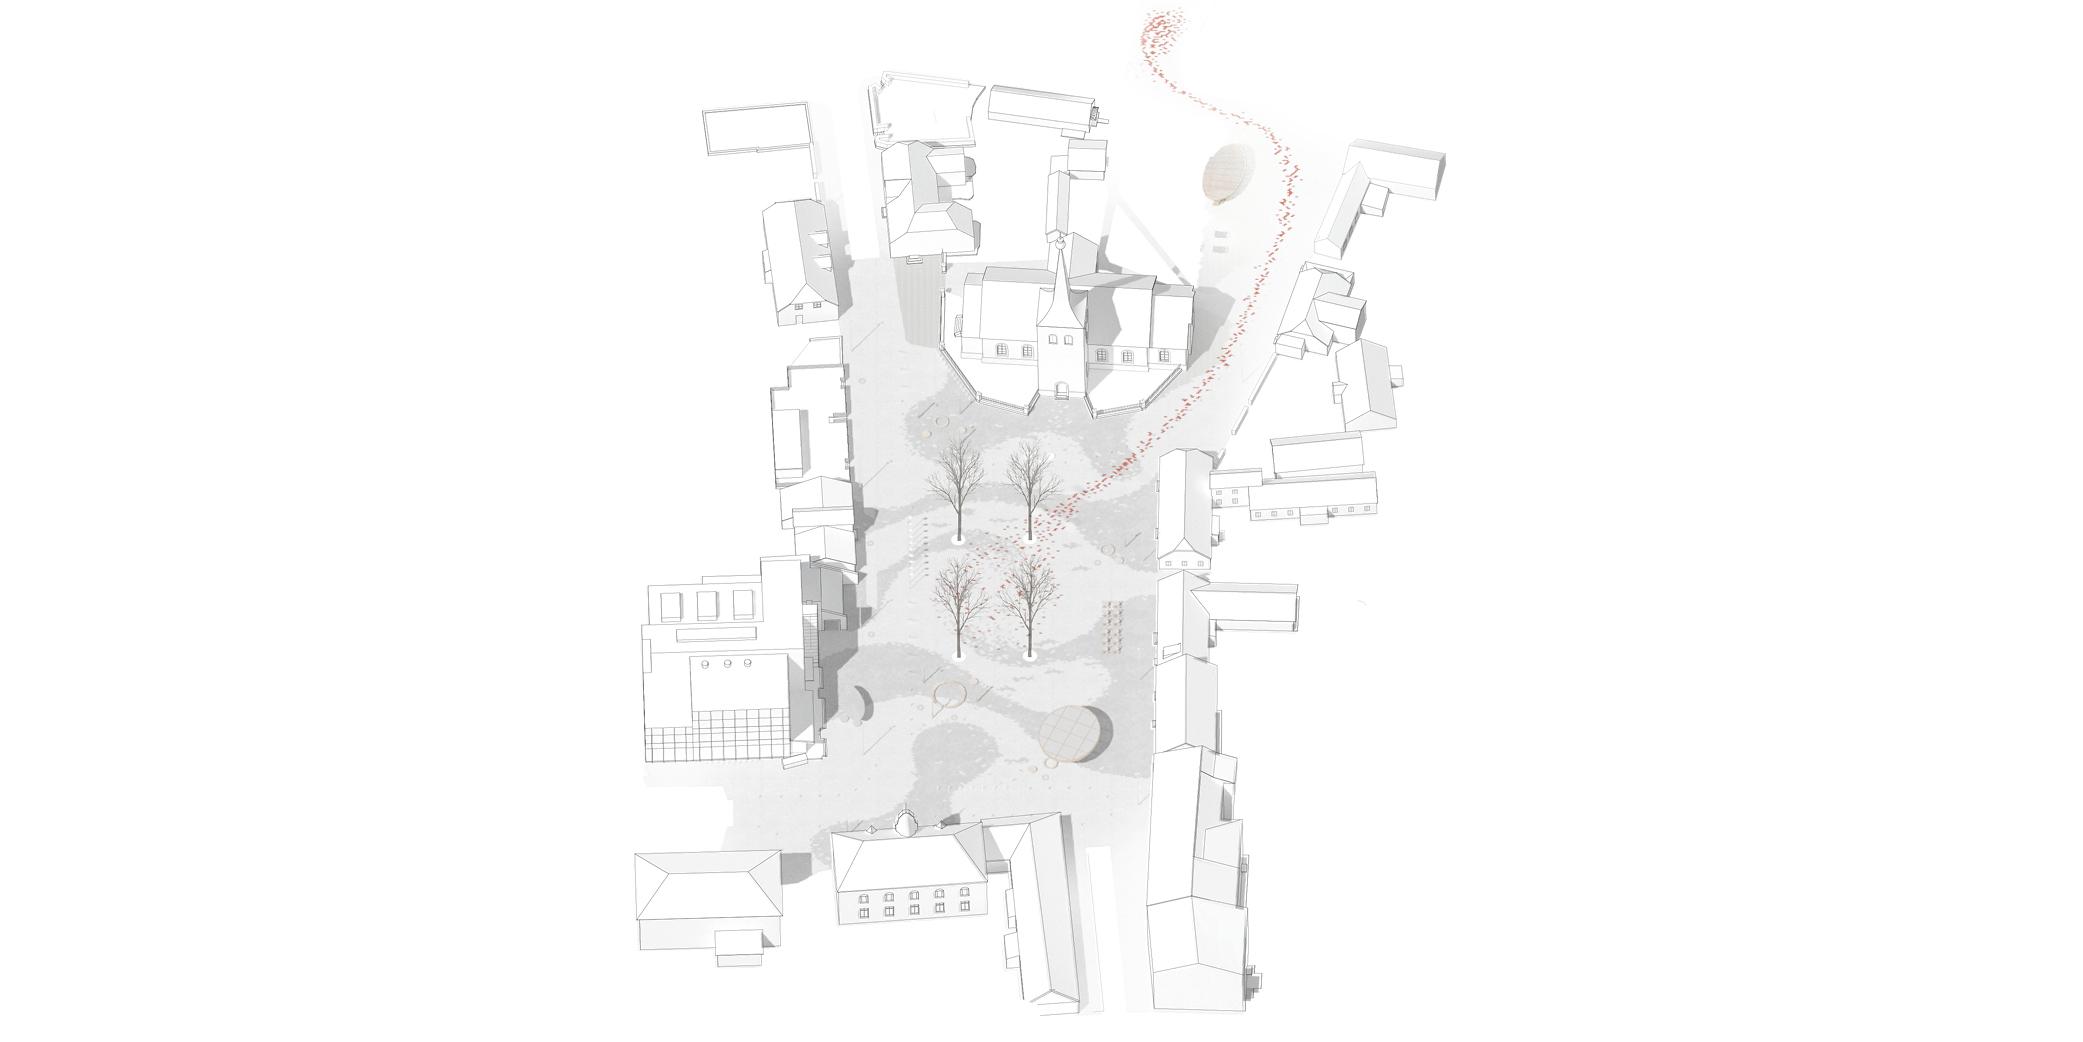 OCA architects urban architecture competition Paide Central Paide keskvaljaku arhitektuurivoistluse Hernan Lleida Ruiz Bernardo Garcia Morales Linn Nagel_web17